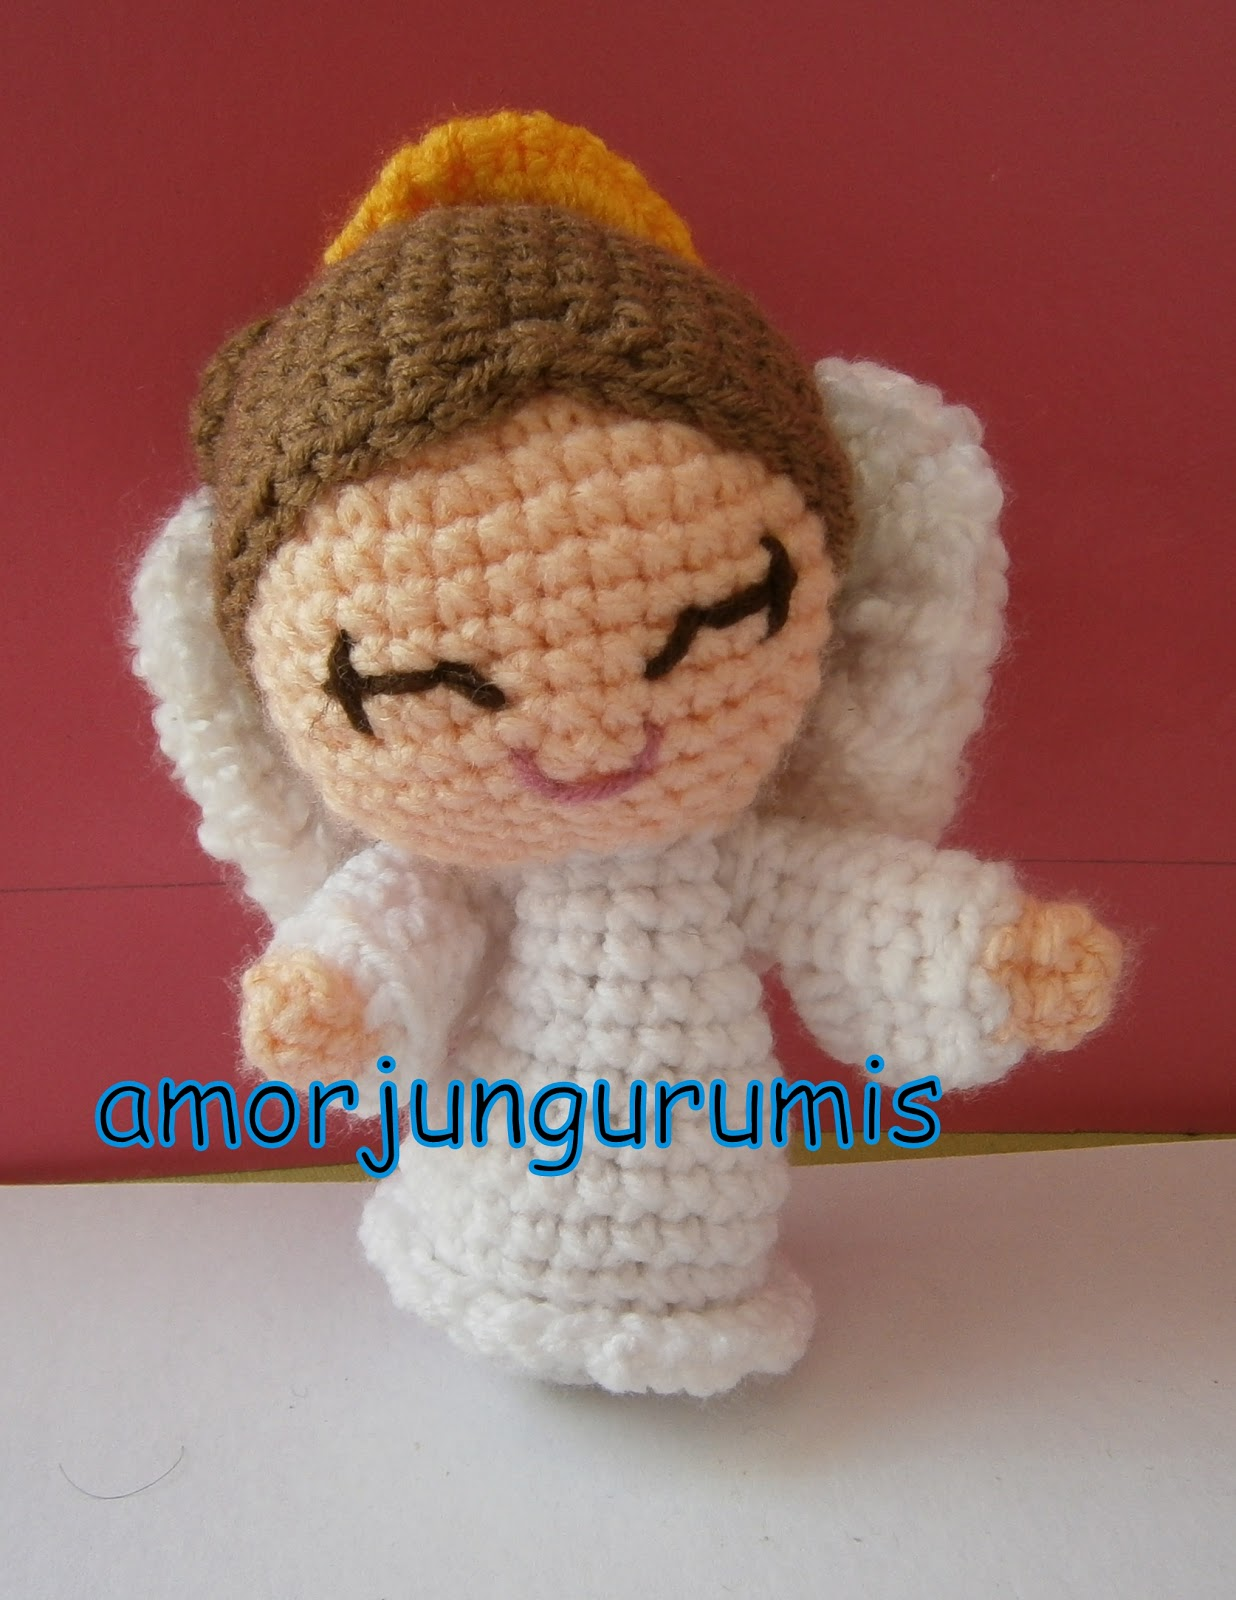 Amigurumi De Angel : AMORJUN...GURUMIS!: AMORJUNGURUMIS ANGEL AMIGURUMI